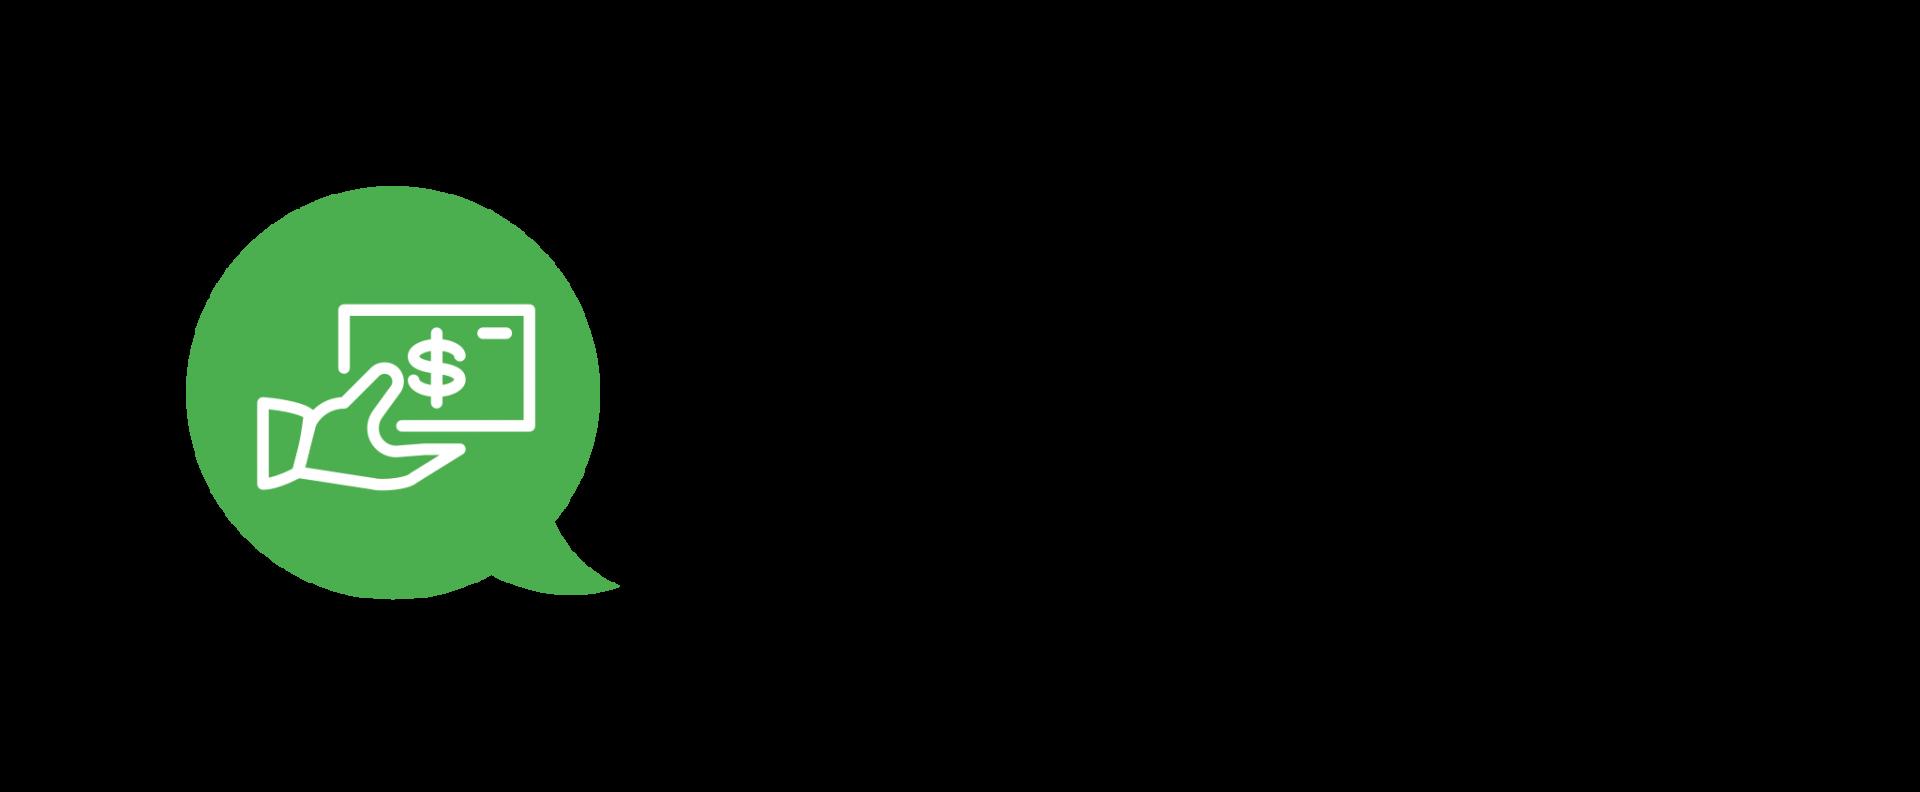 Meneses Invest, LLC logo